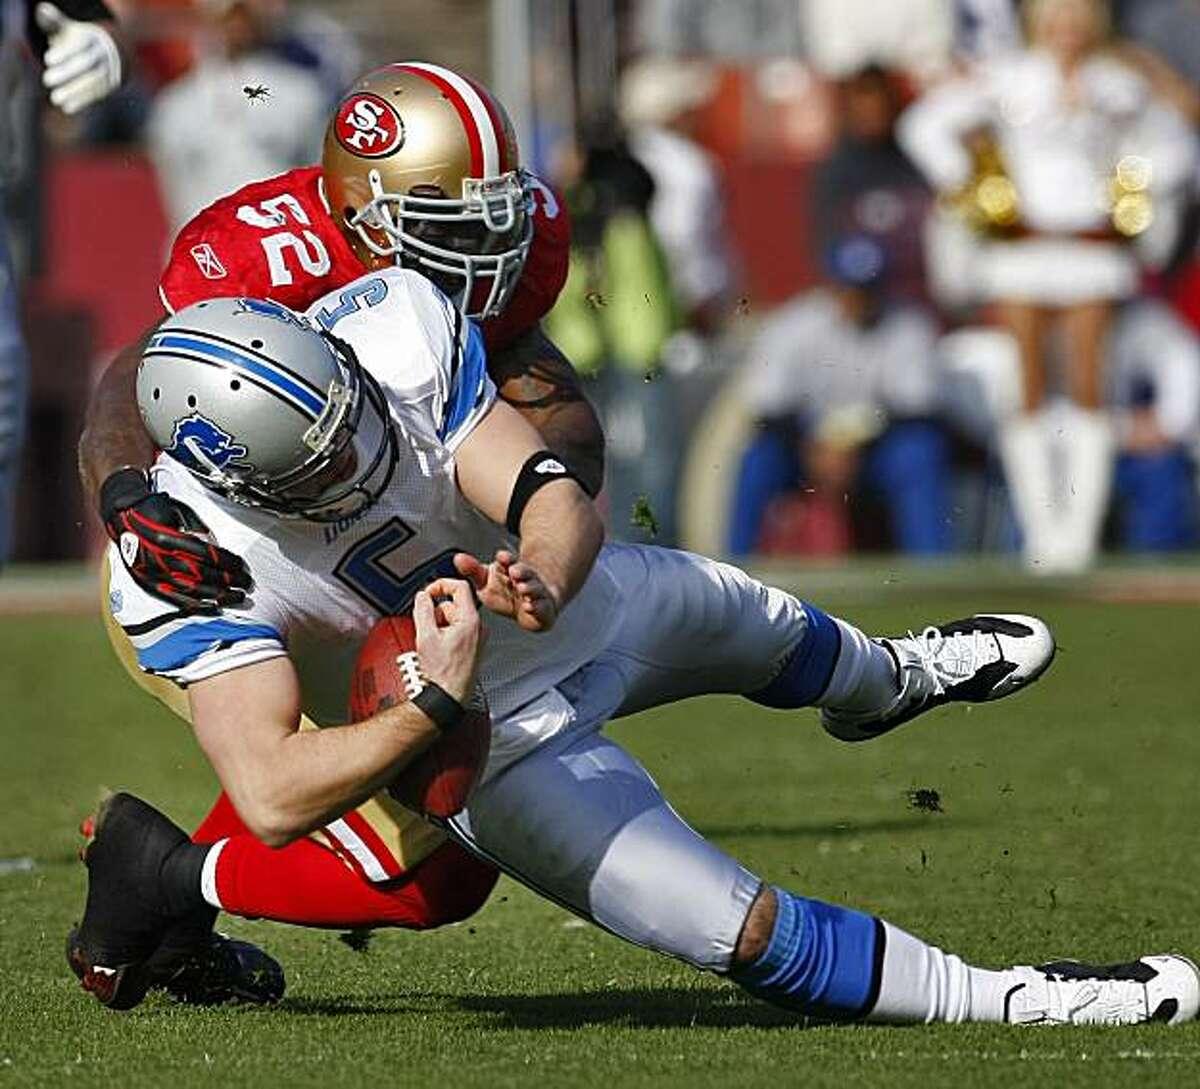 San Francisco 49ers Patrick Willis sacks Detroit Lions quarterback Drew Stanton in the first half of the games, Sunday Dec. 27, 2009, in San Francisco, Calif.